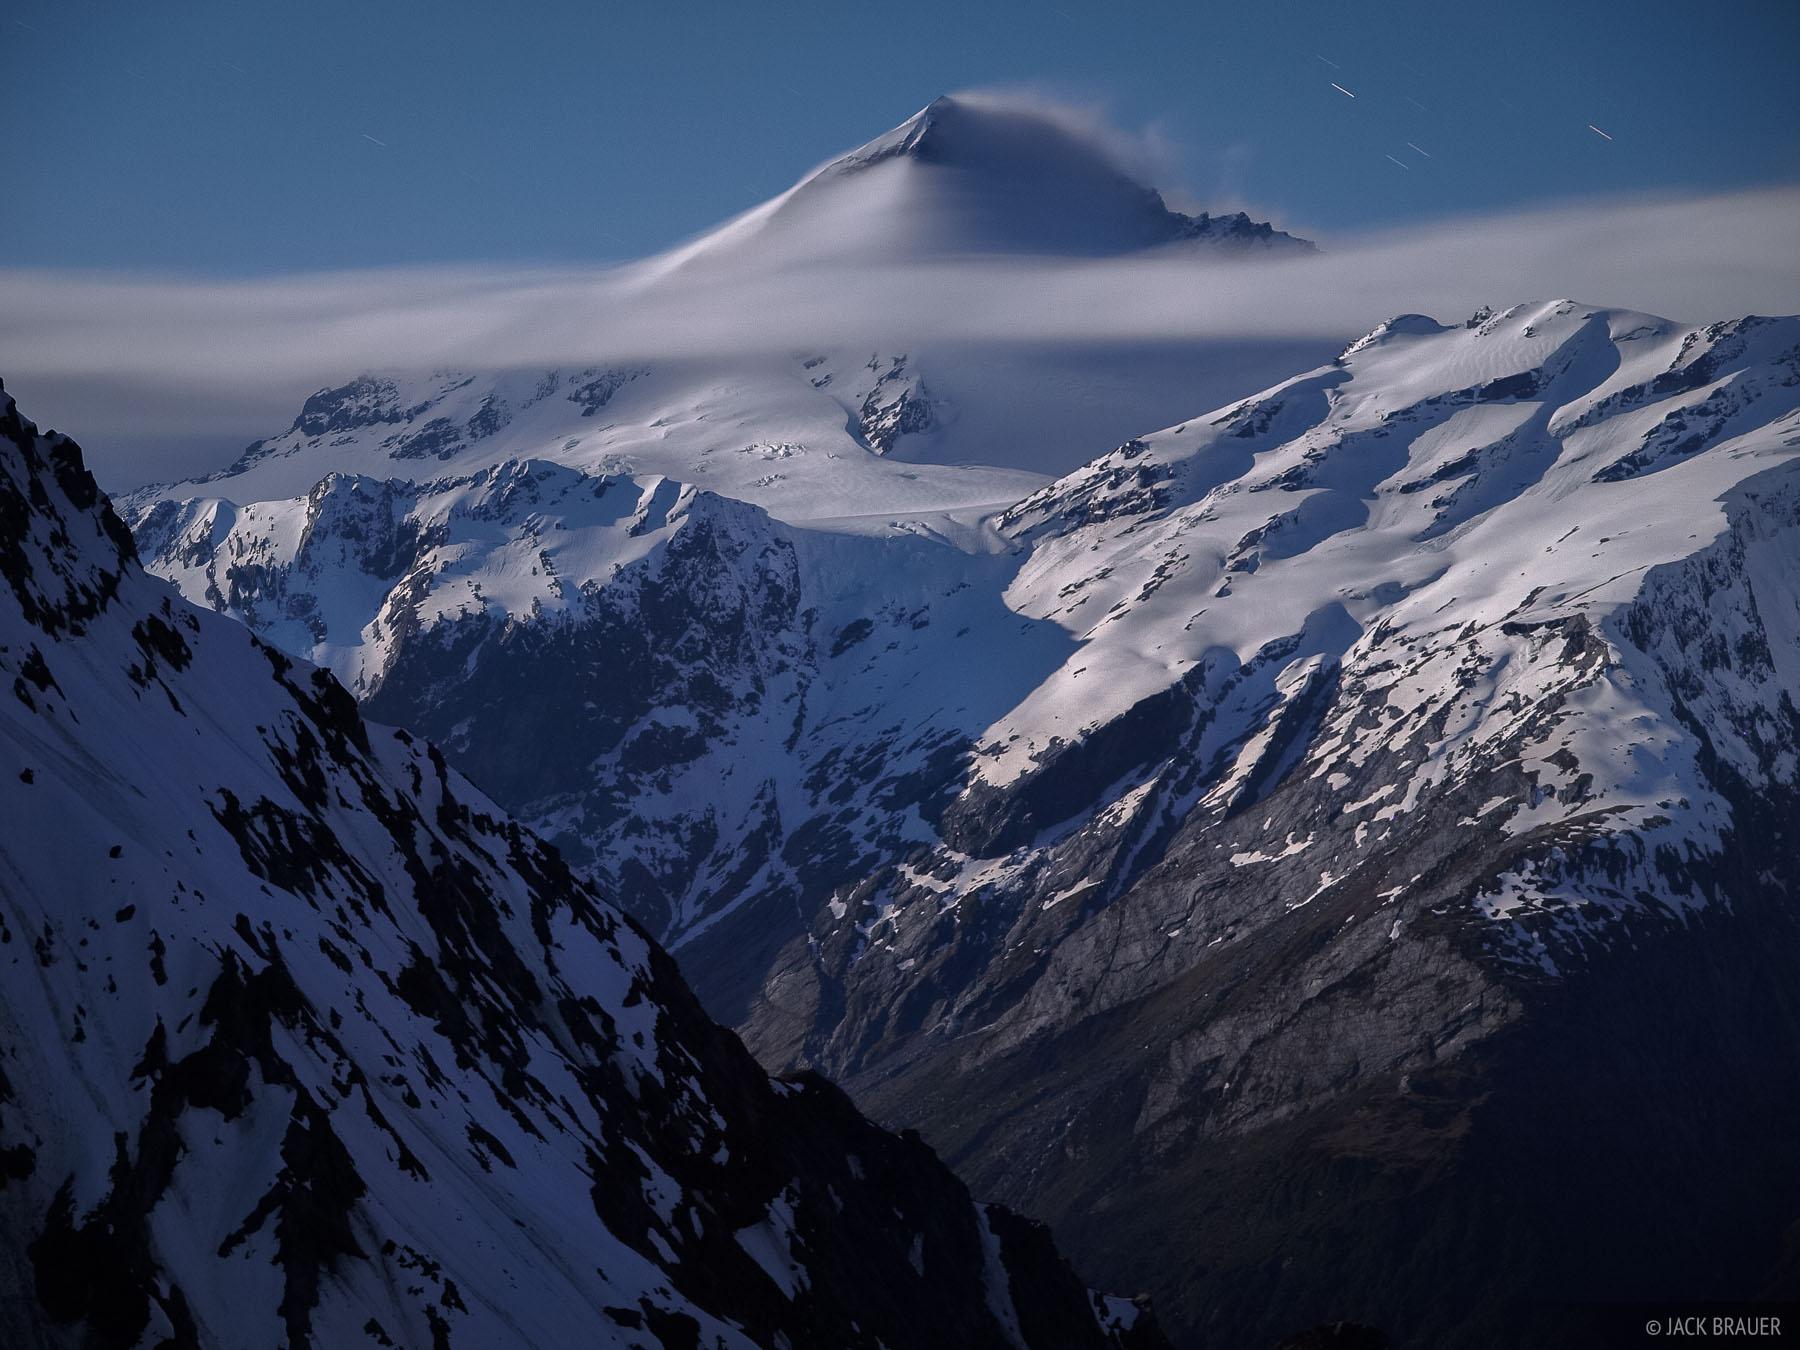 Mt. Aspiring, moonlight, New Zealand, photo